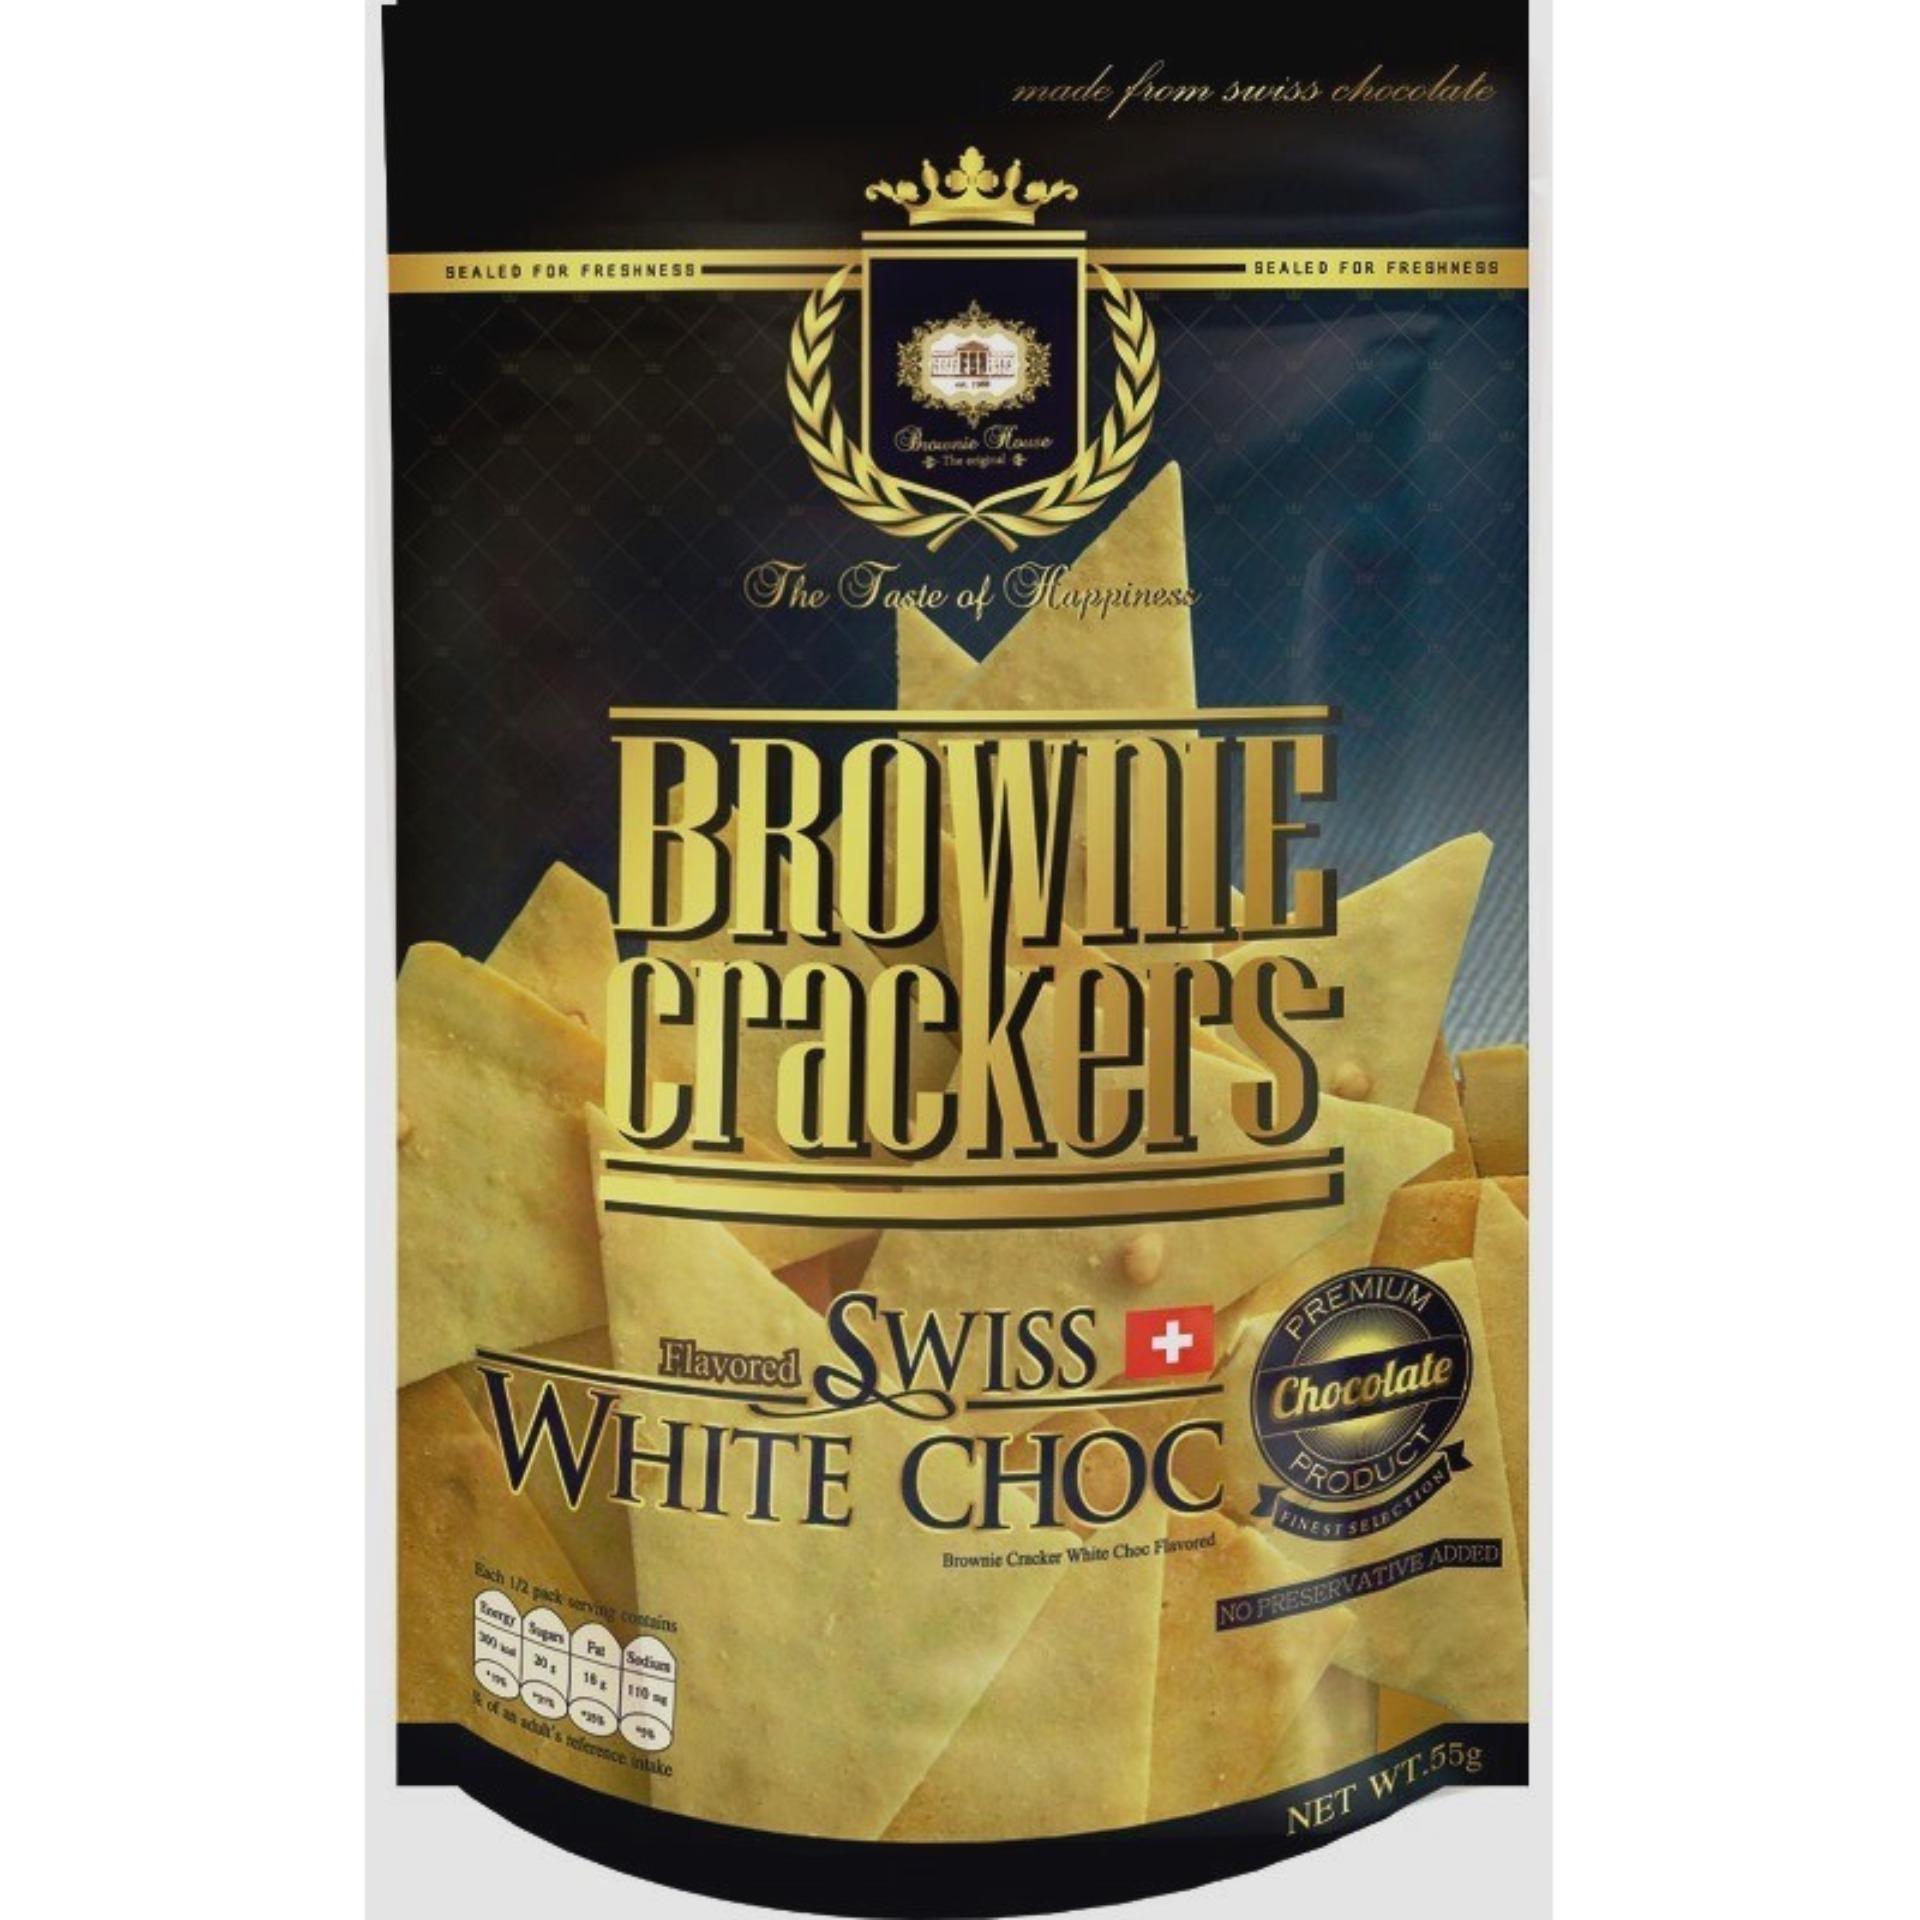 Brownie Crackers 55g X 5packs Bundle (swiss White Chocolate) - Brownie House The Original By Nomlah Trading.